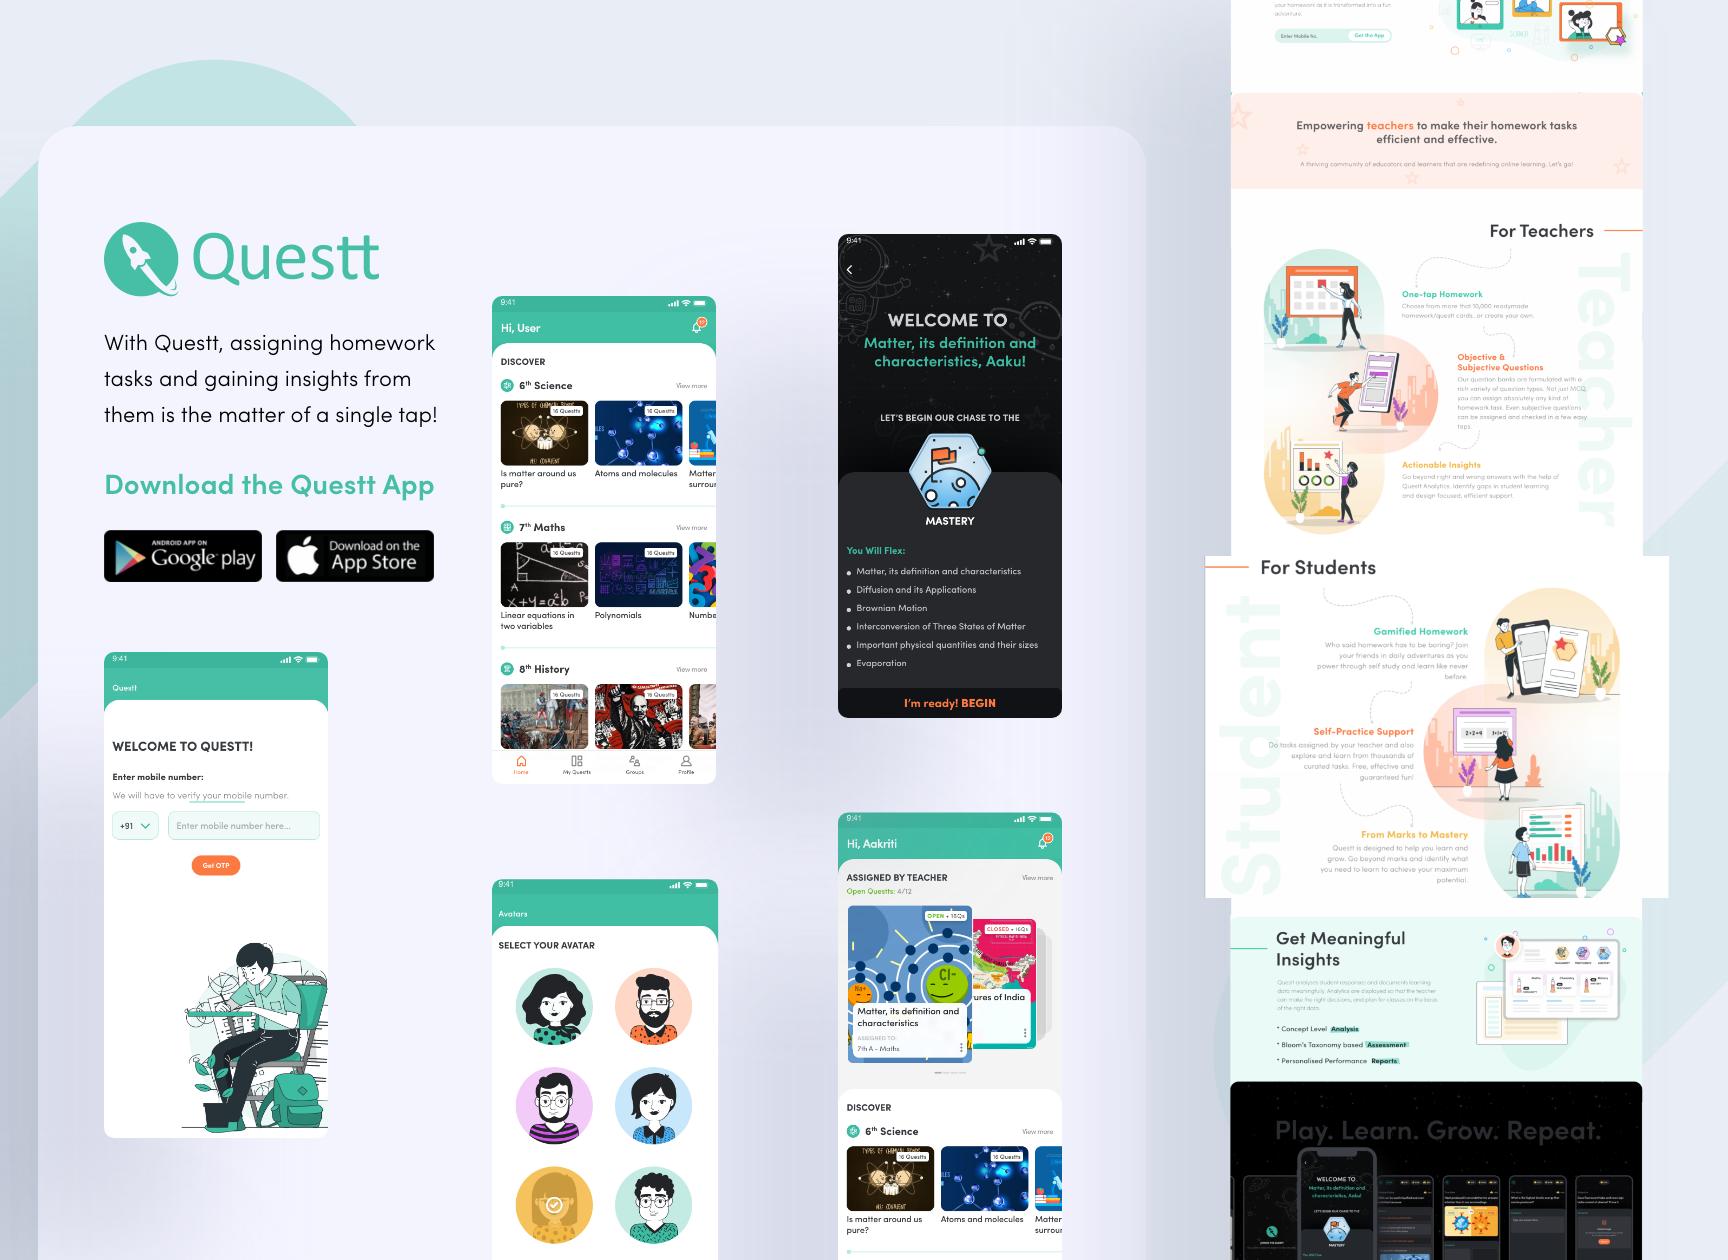 Questt App - Student Login